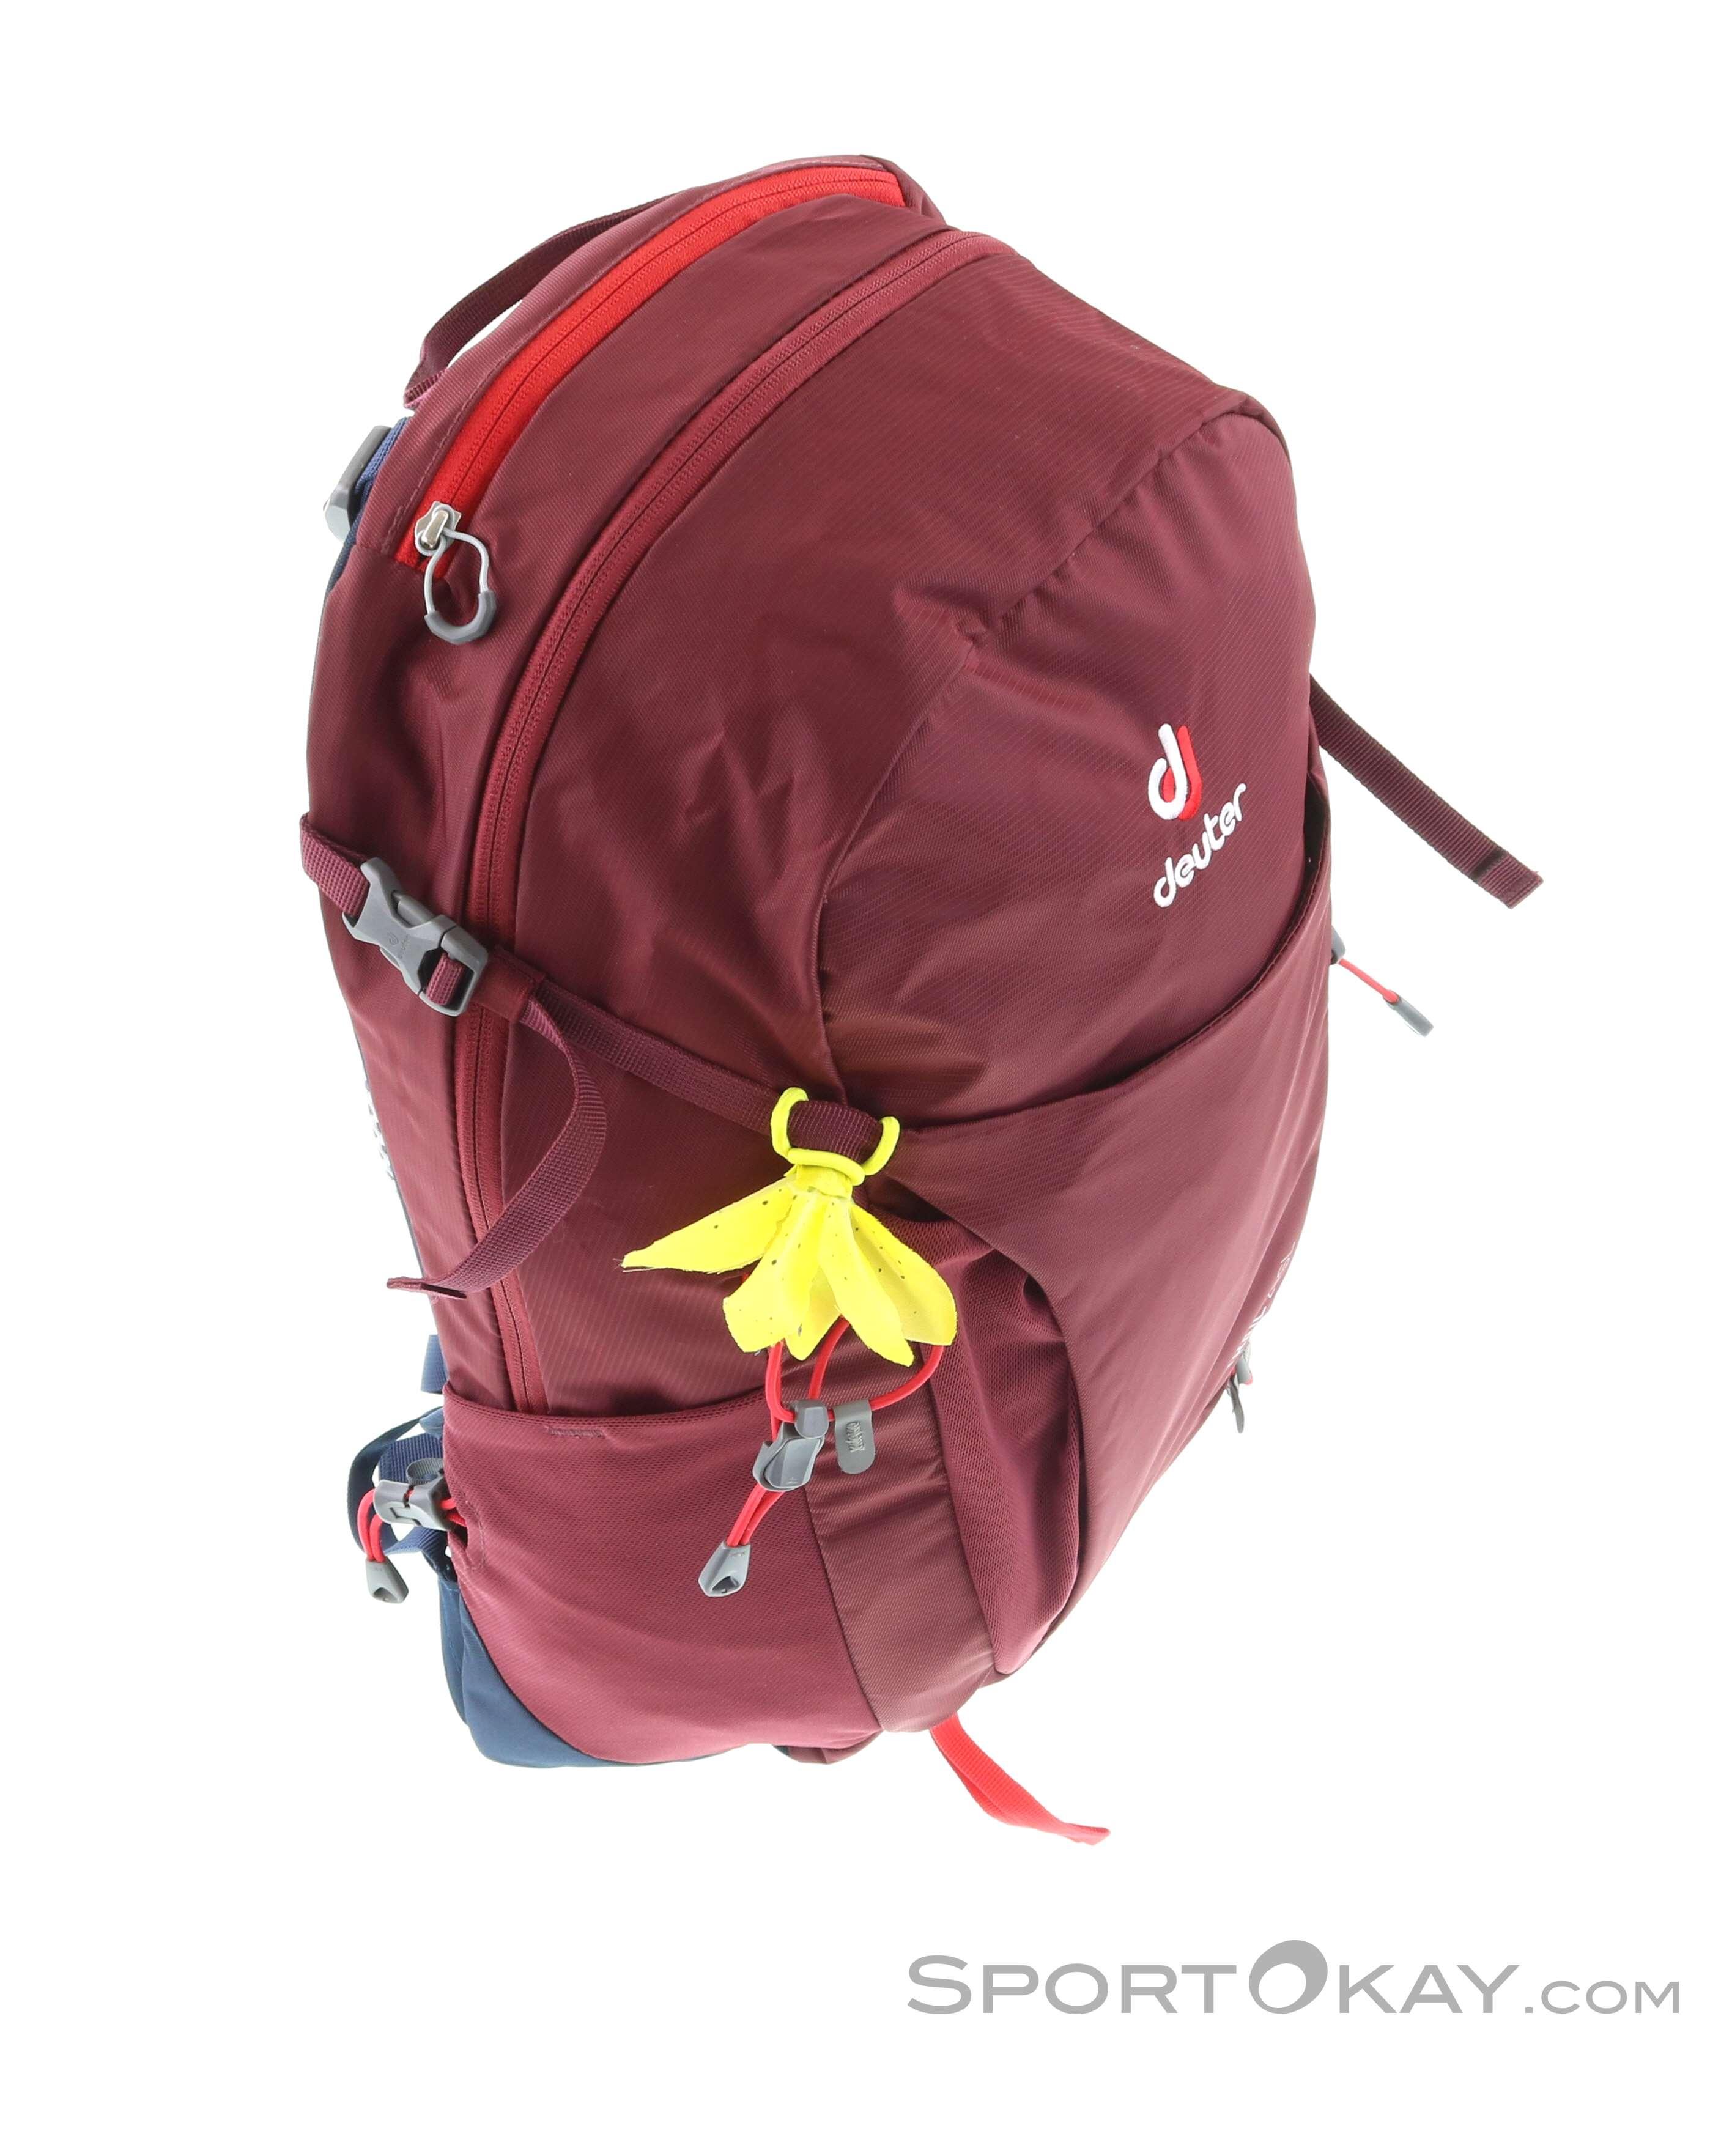 bf7517207380d Deuter Trail SL 24l Womens Backpack - Backpacks - Backpacks ...